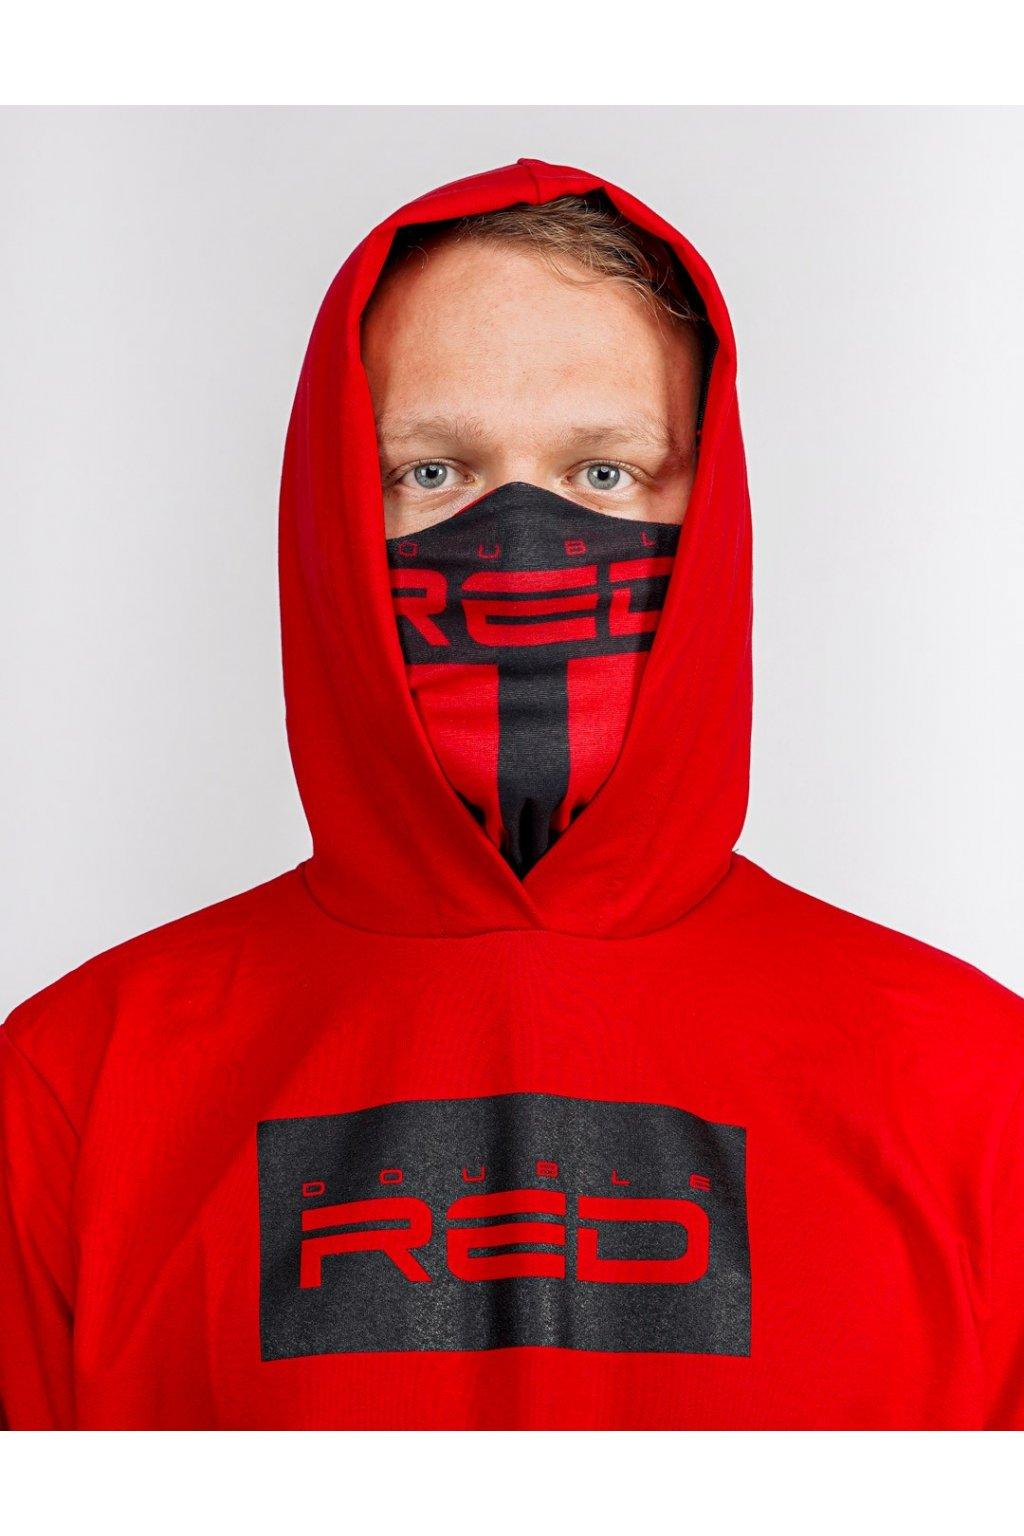 Double Red pánská mikina Red 2in1 Hoodie & Snood Black obr1